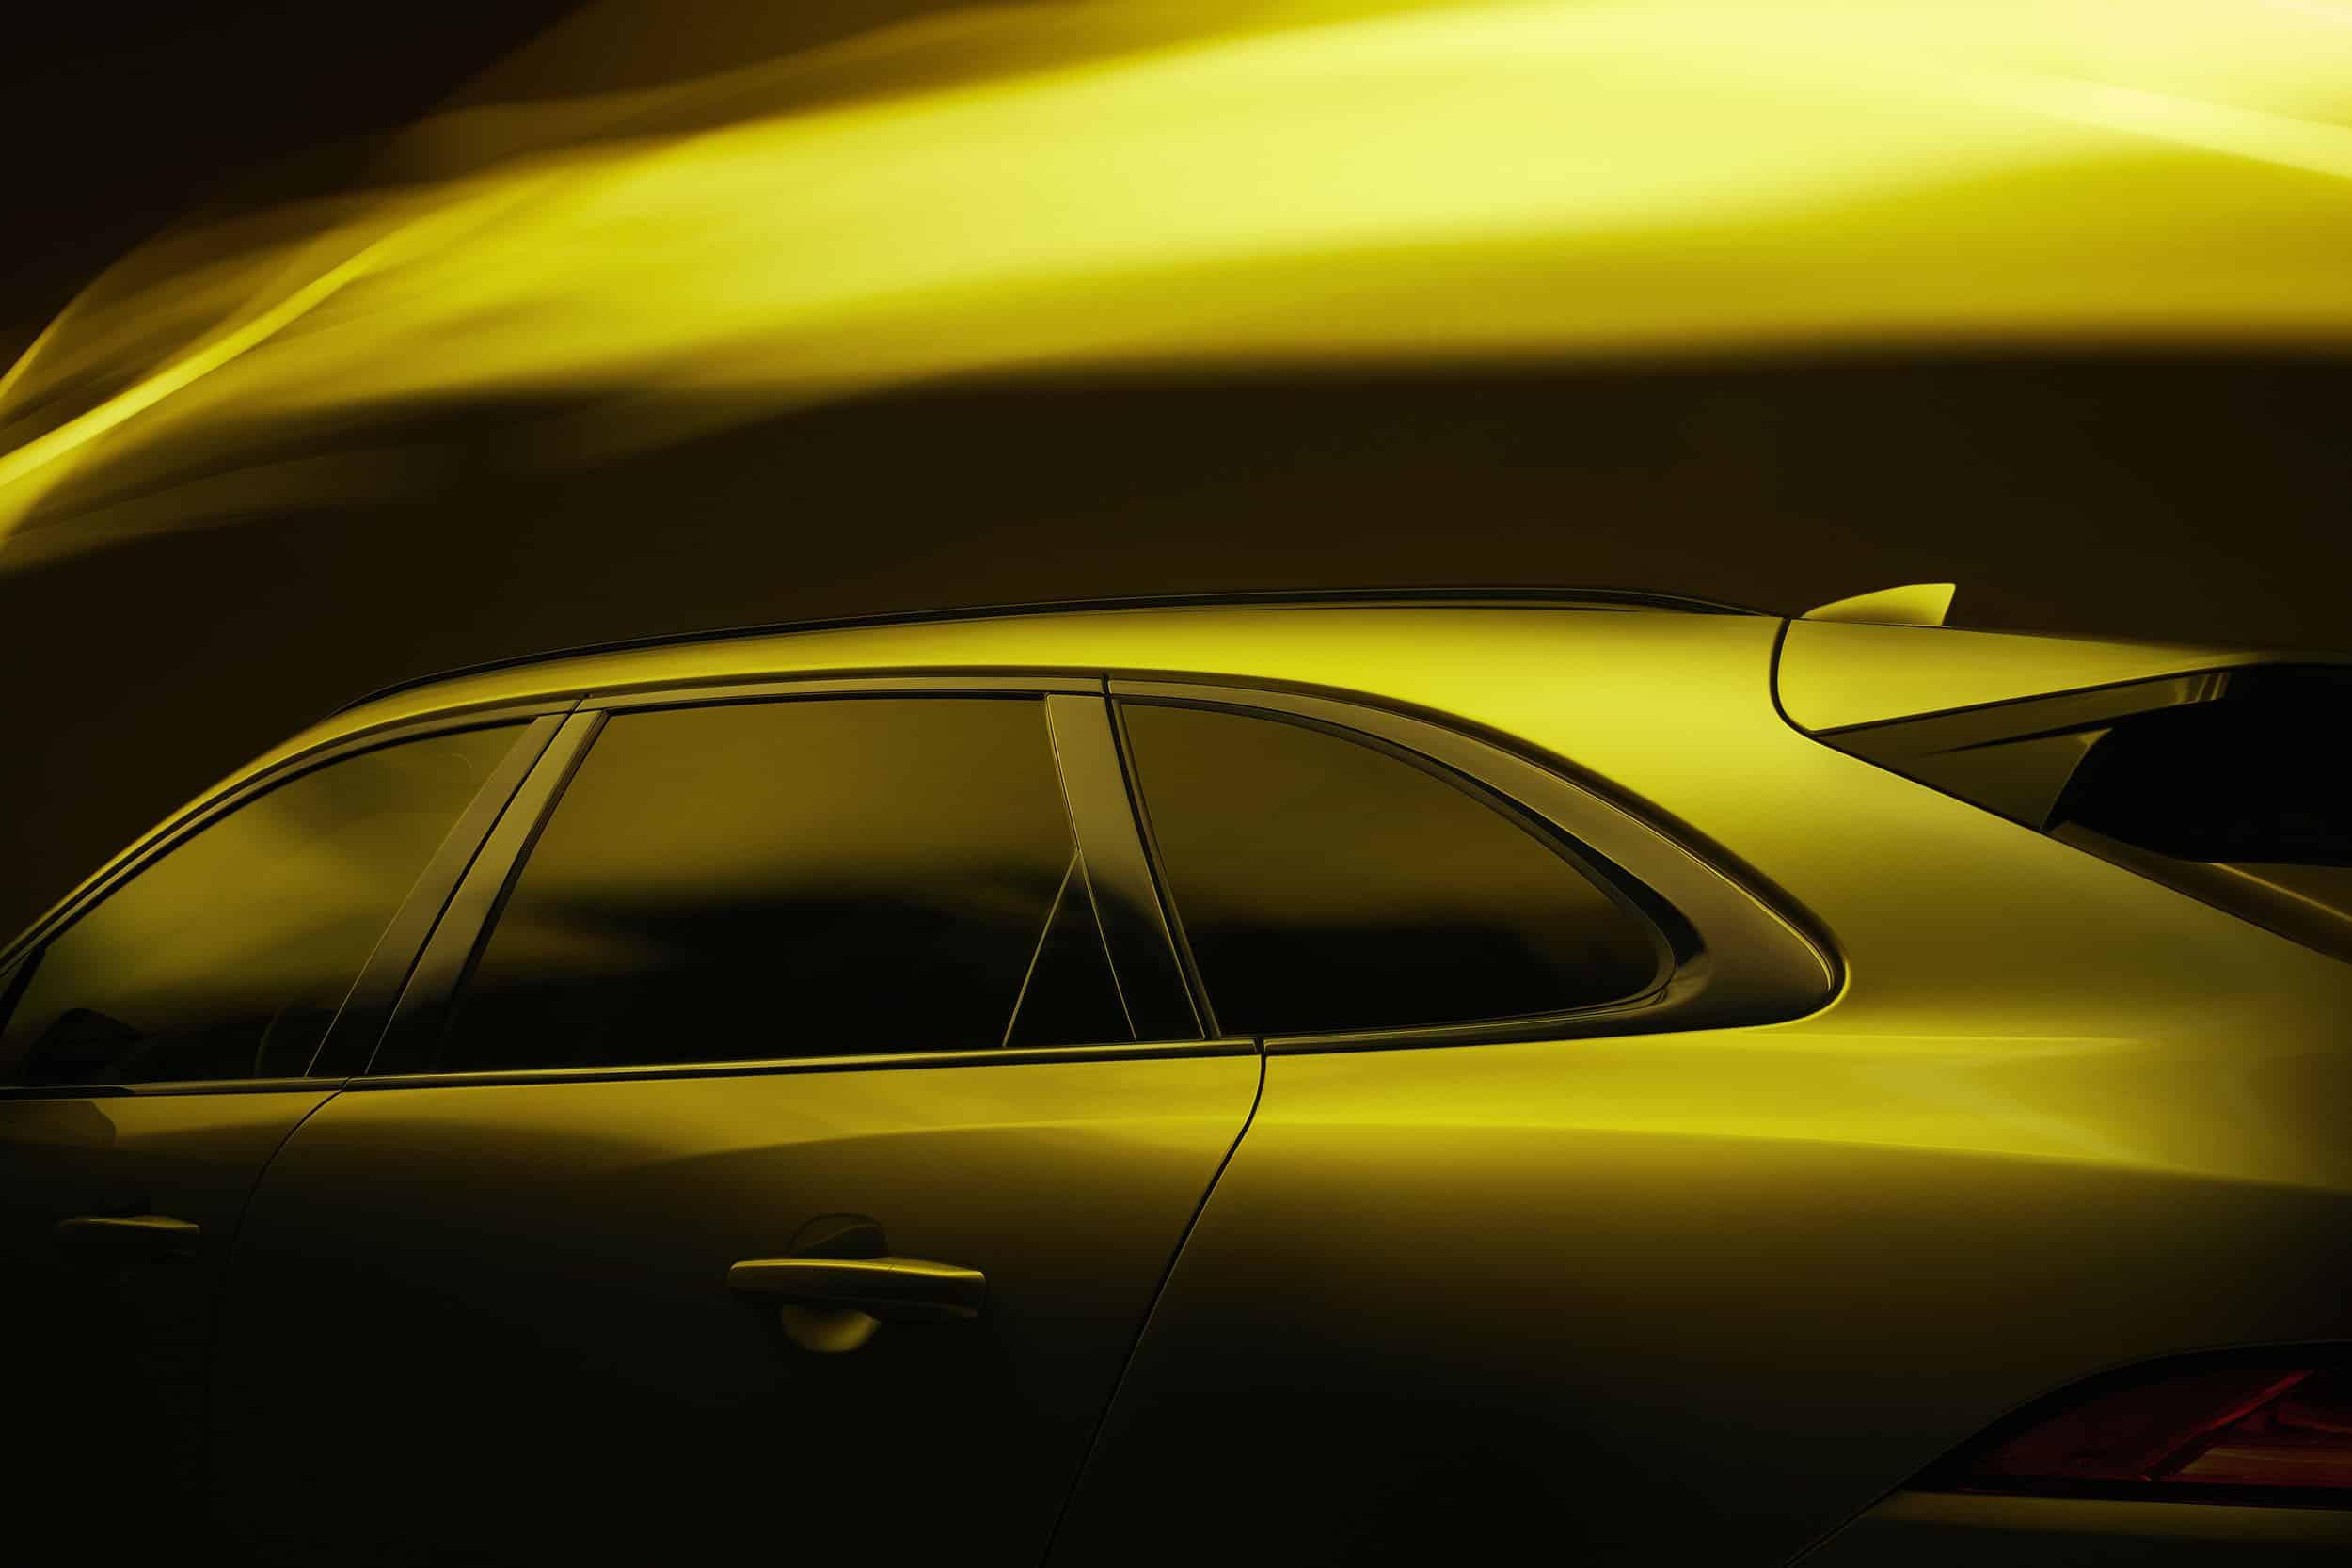 studio-ignatov-wkw-automotive-imagekampagne-01